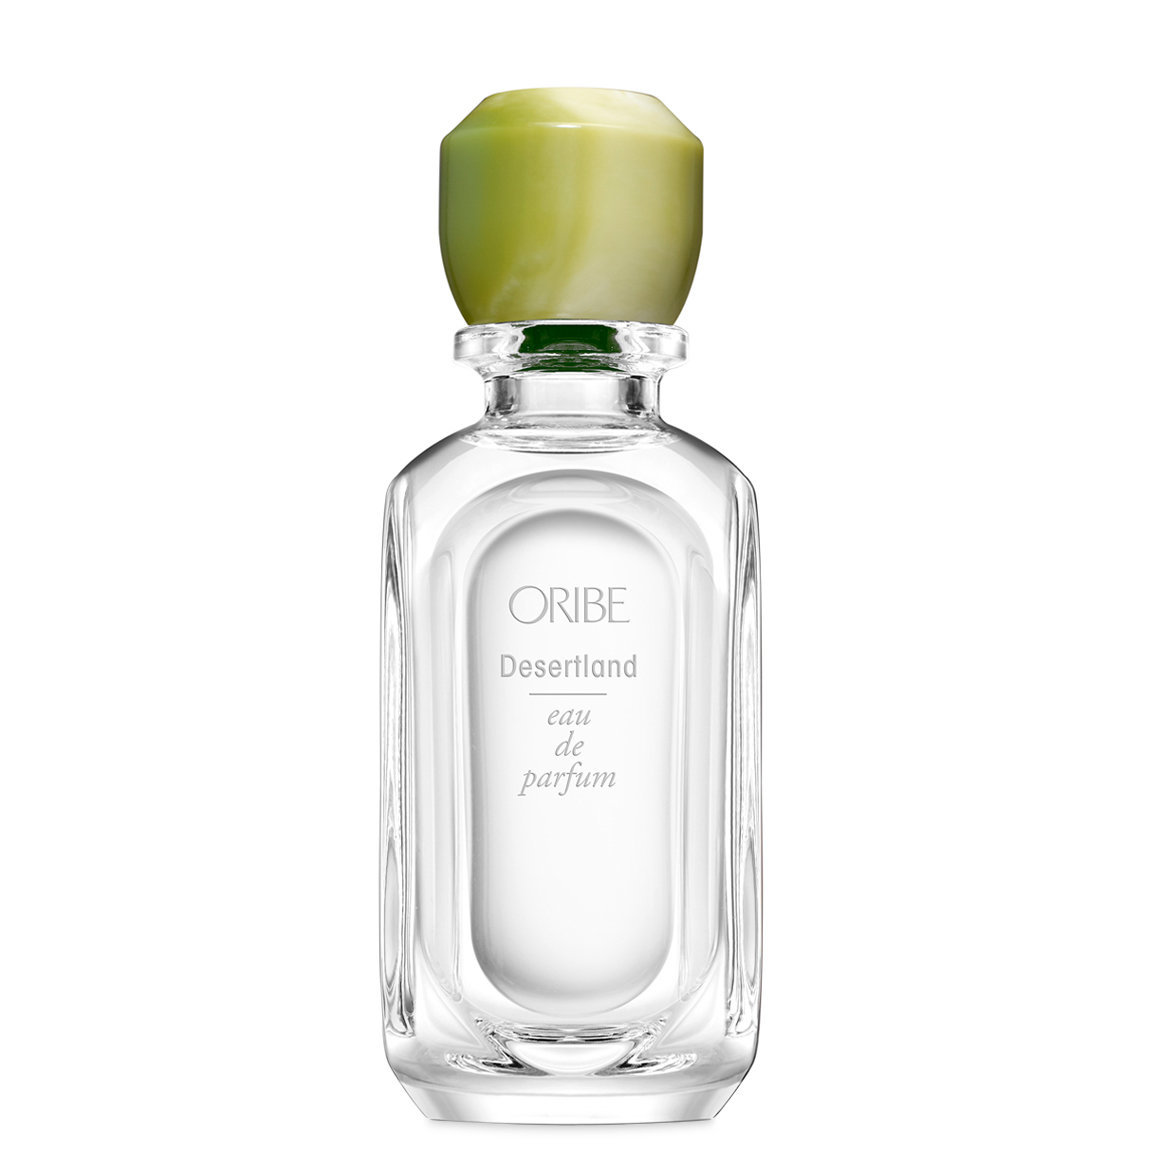 Oribe Desertland 75 ml alternative view 1 - product swatch.